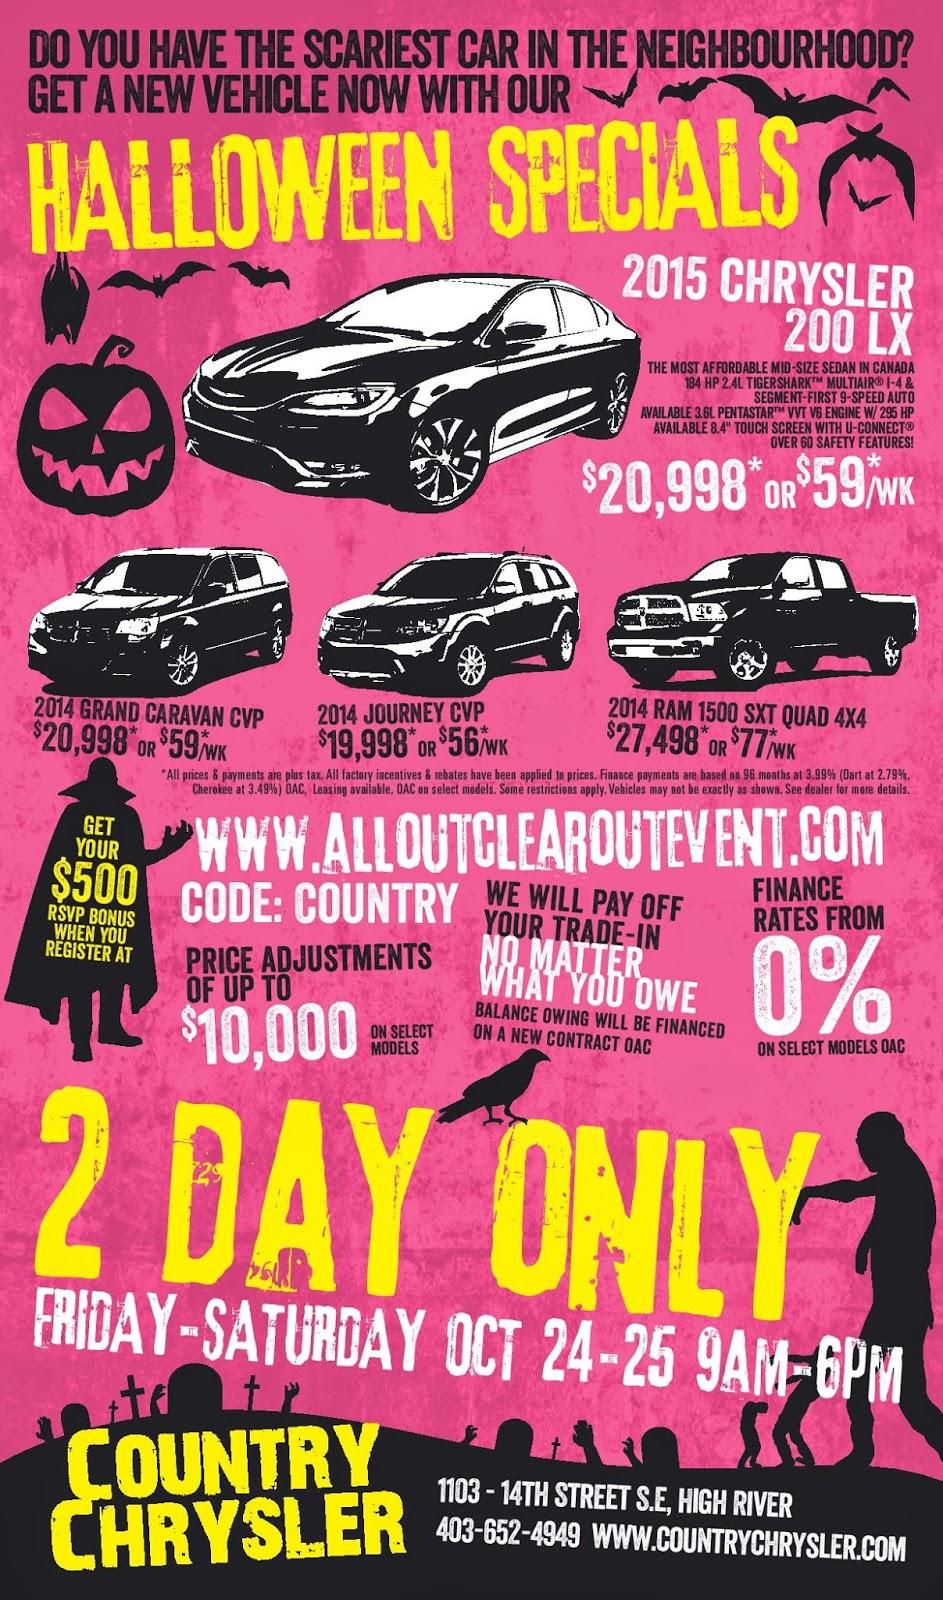 The Country Chrysler Blog